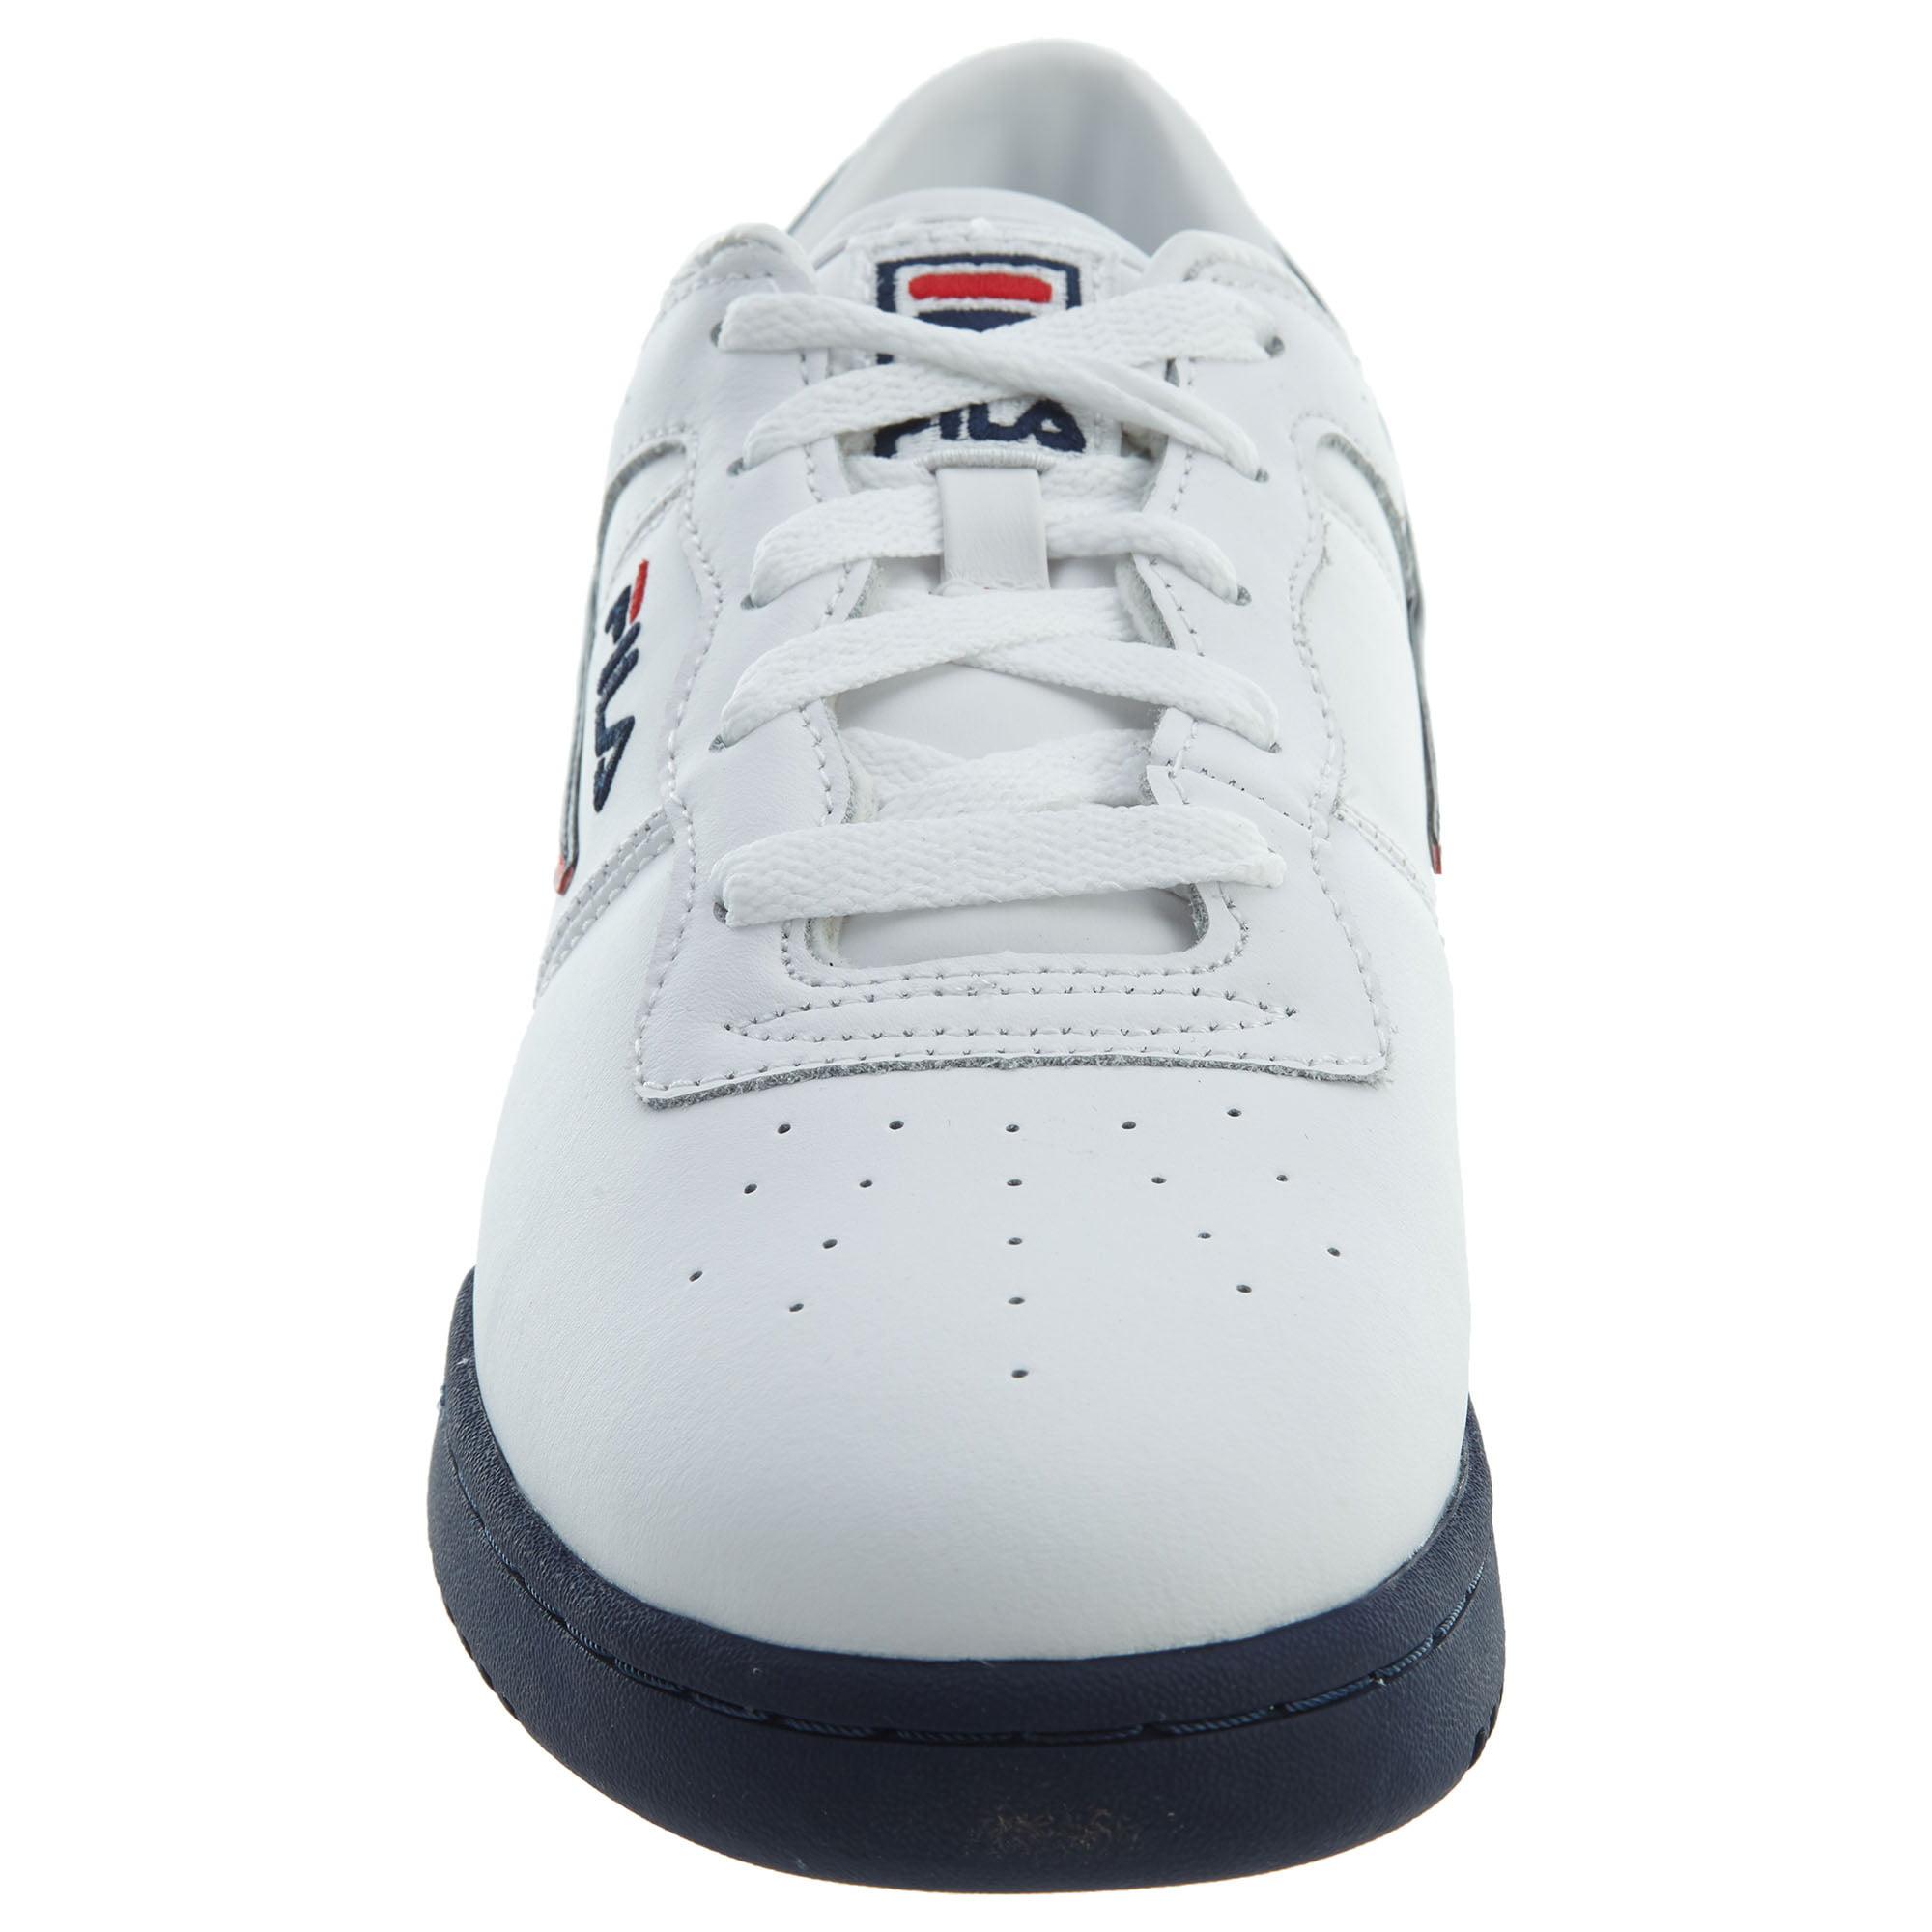 96df99798fd Fila - Fila 3VF80105-970   Original Fitness Kid Black Red White Sneakers -  Walmart.com